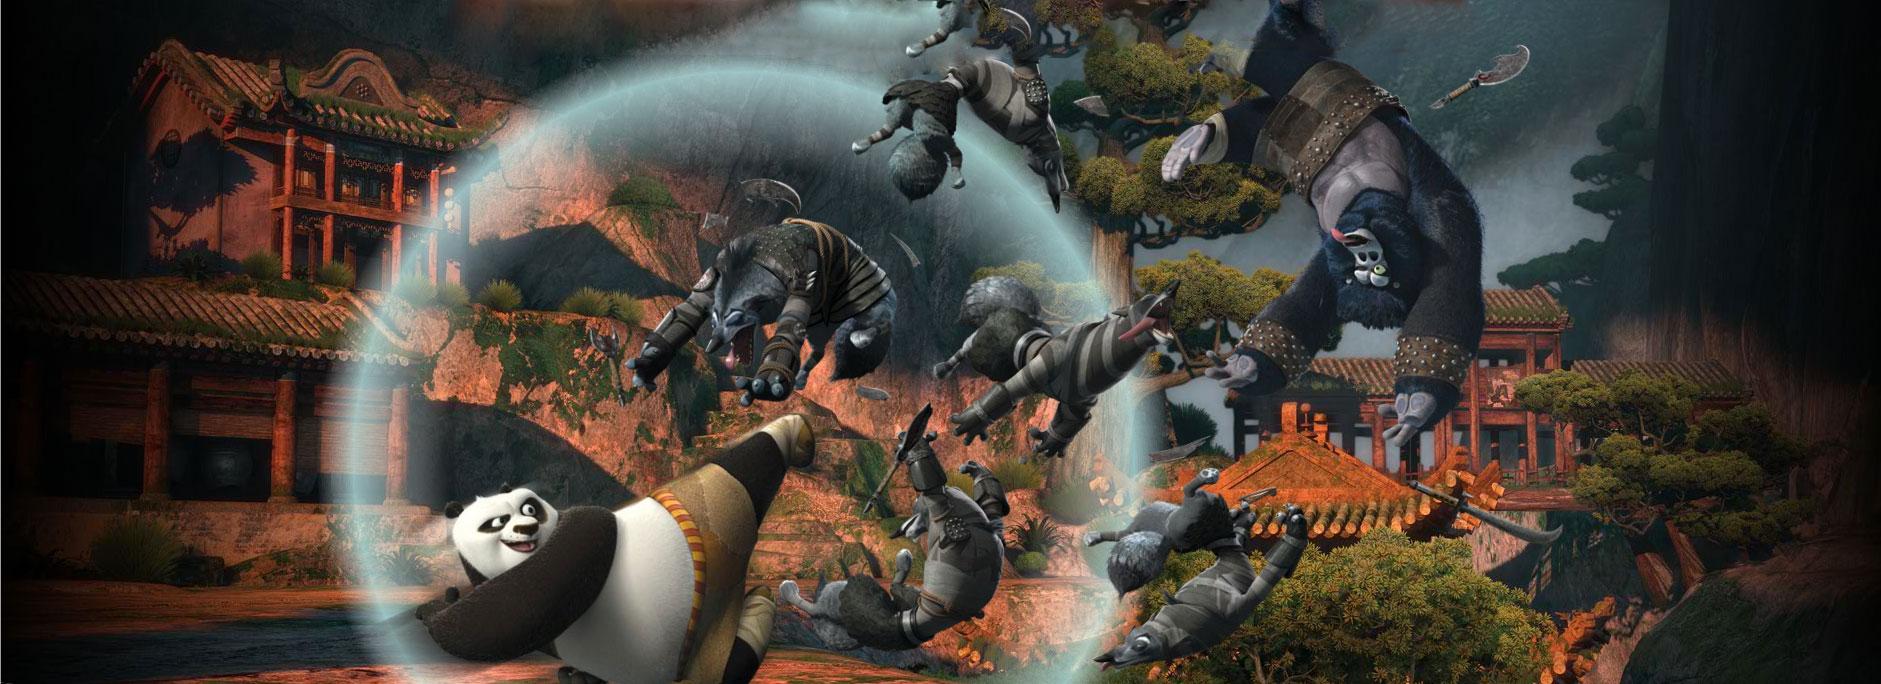 Po Fighting Wolves In Kung Fu Panda 2 Desktop Wallpaper